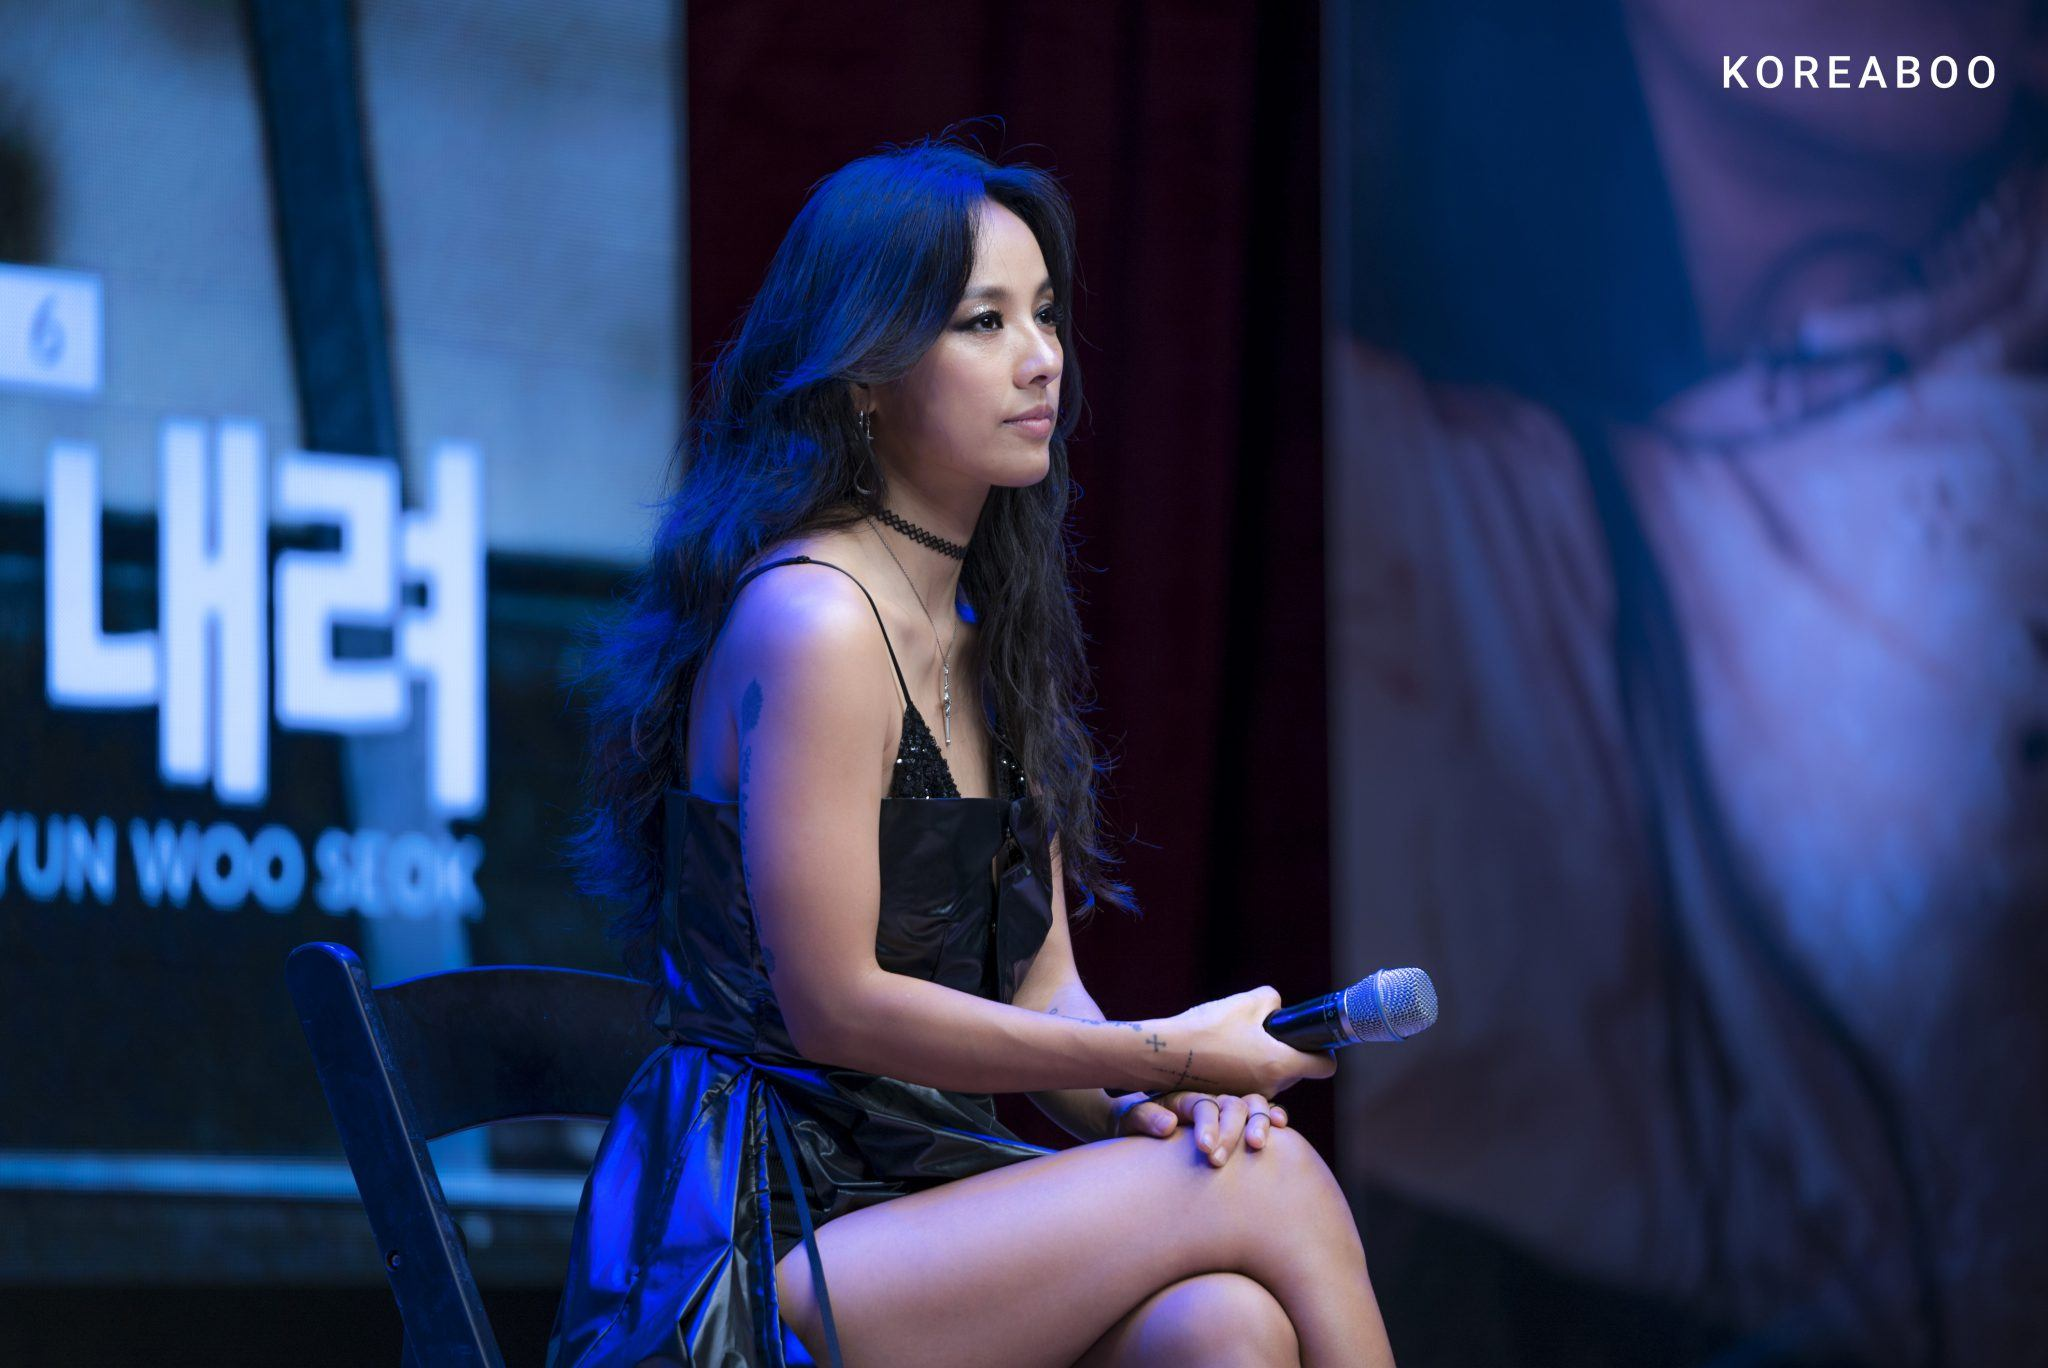 Lee Hyori Chooses This Idol As The Next Lee Hyori Koreaboo